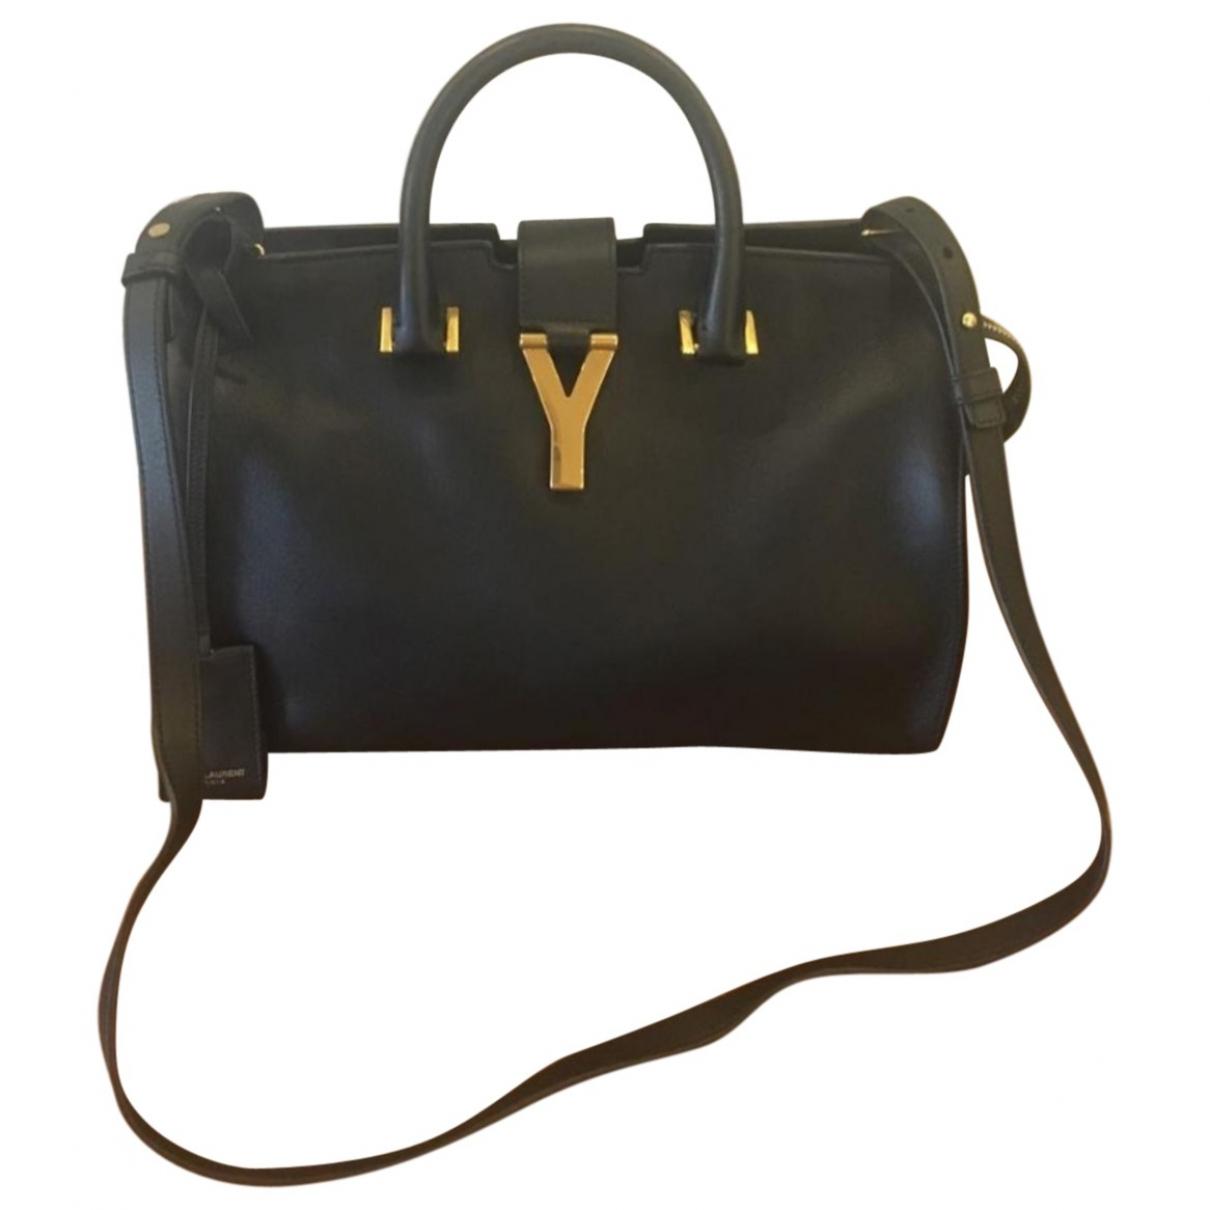 Saint Laurent Chyc Handtasche in  Schwarz Leder